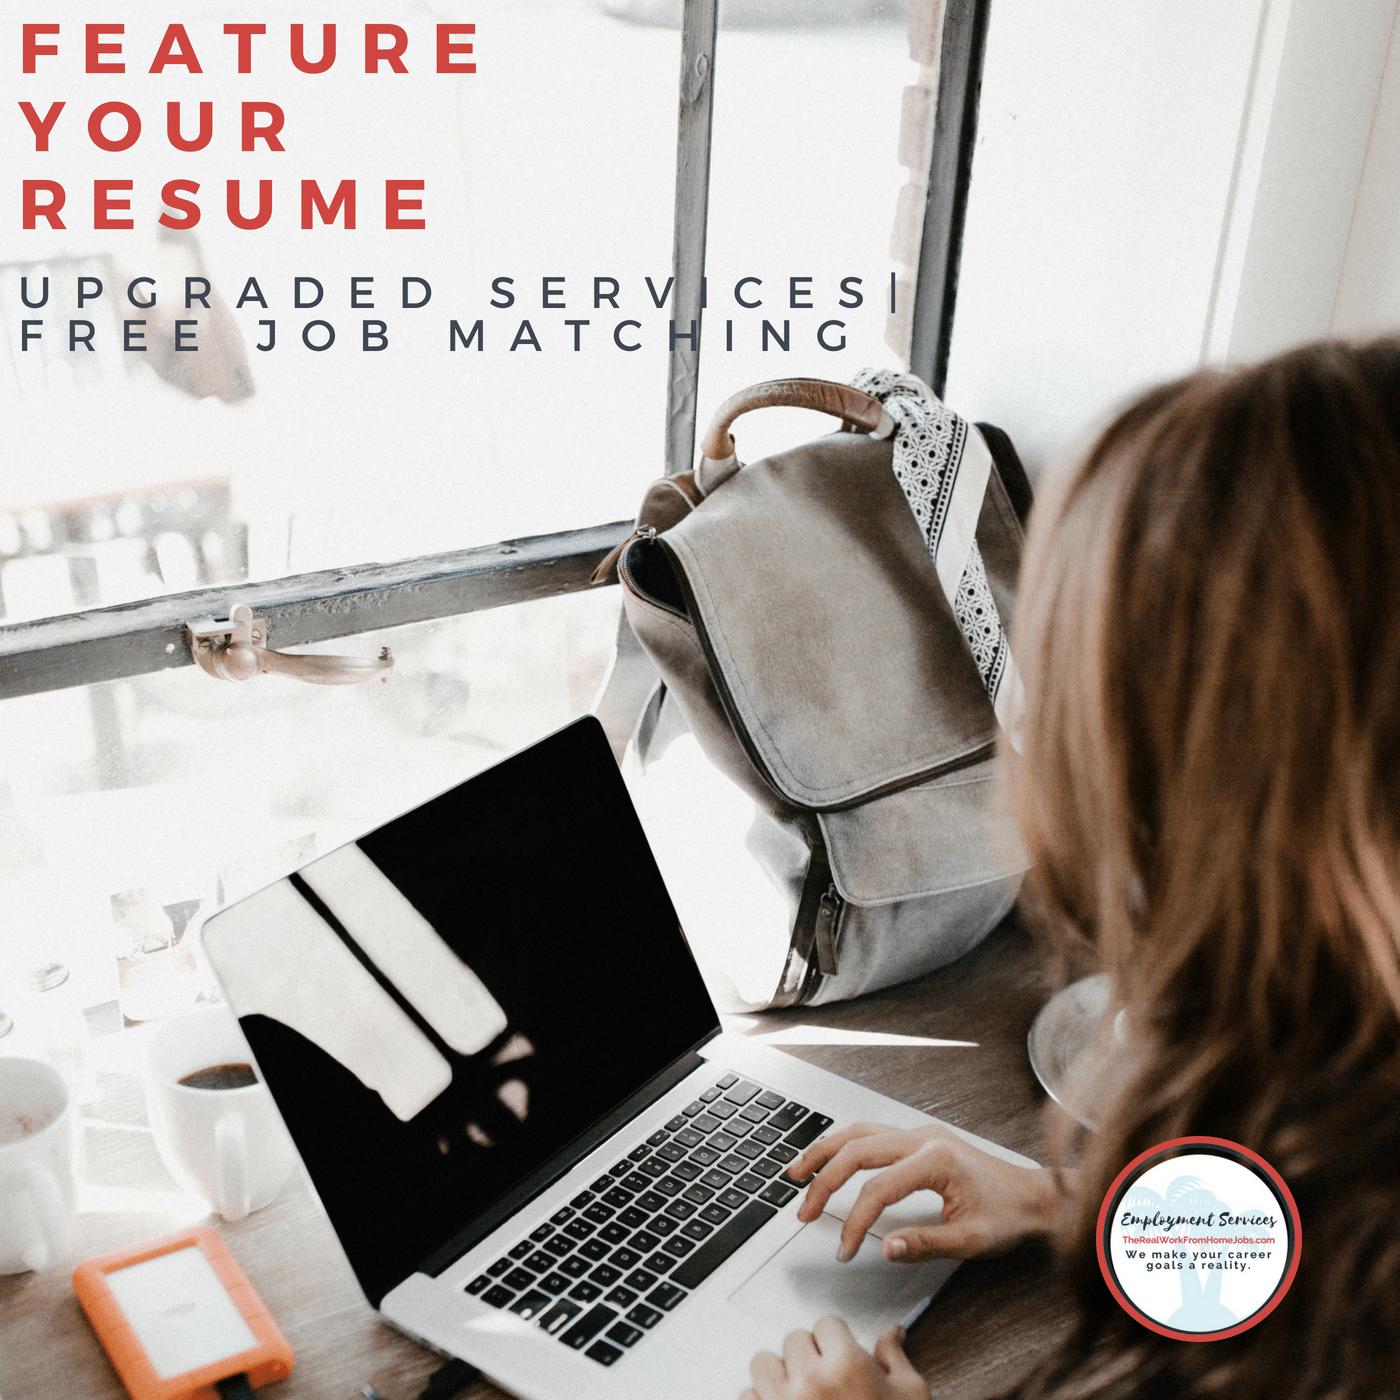 Featured Resume Resume, Easy online jobs, Transcription